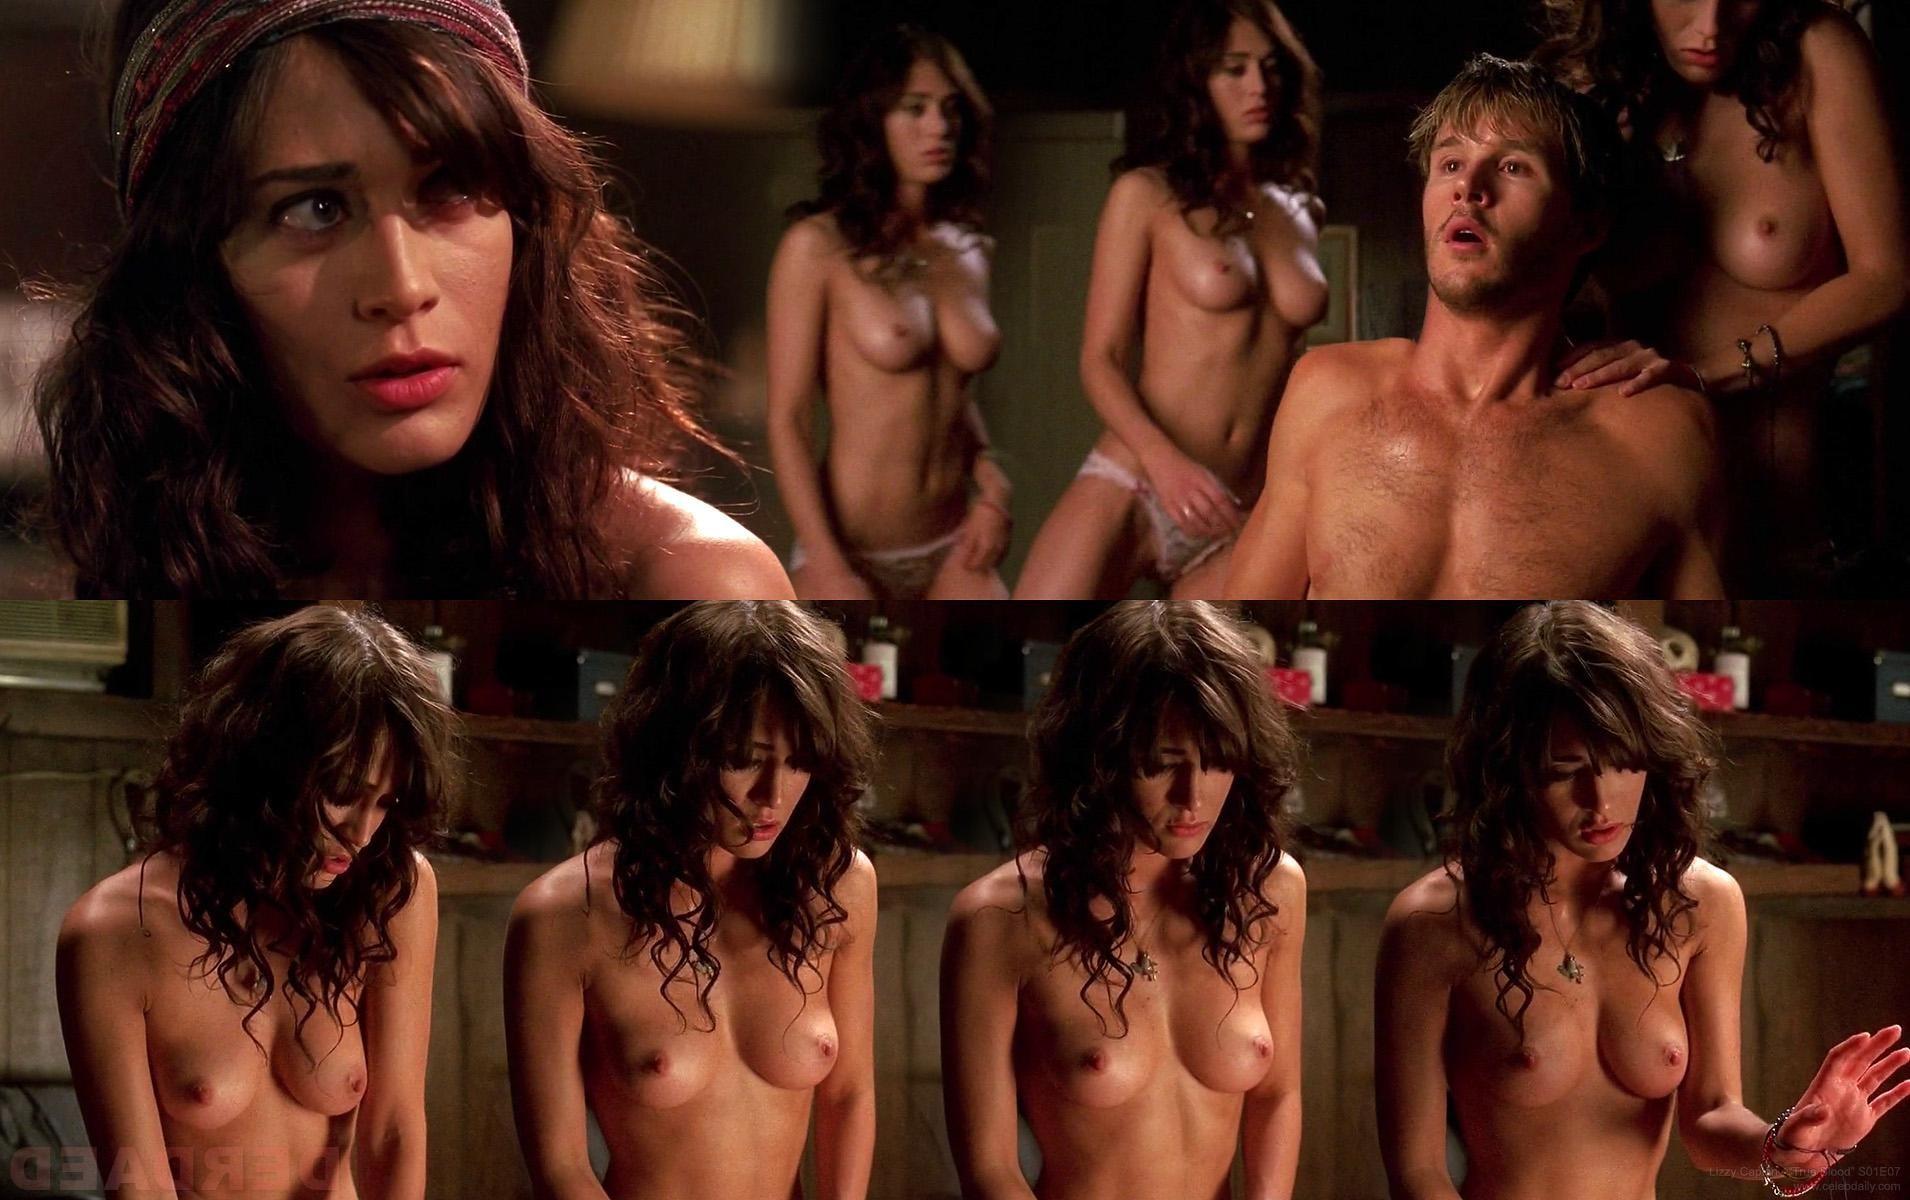 Lindsay rhodes nude pics